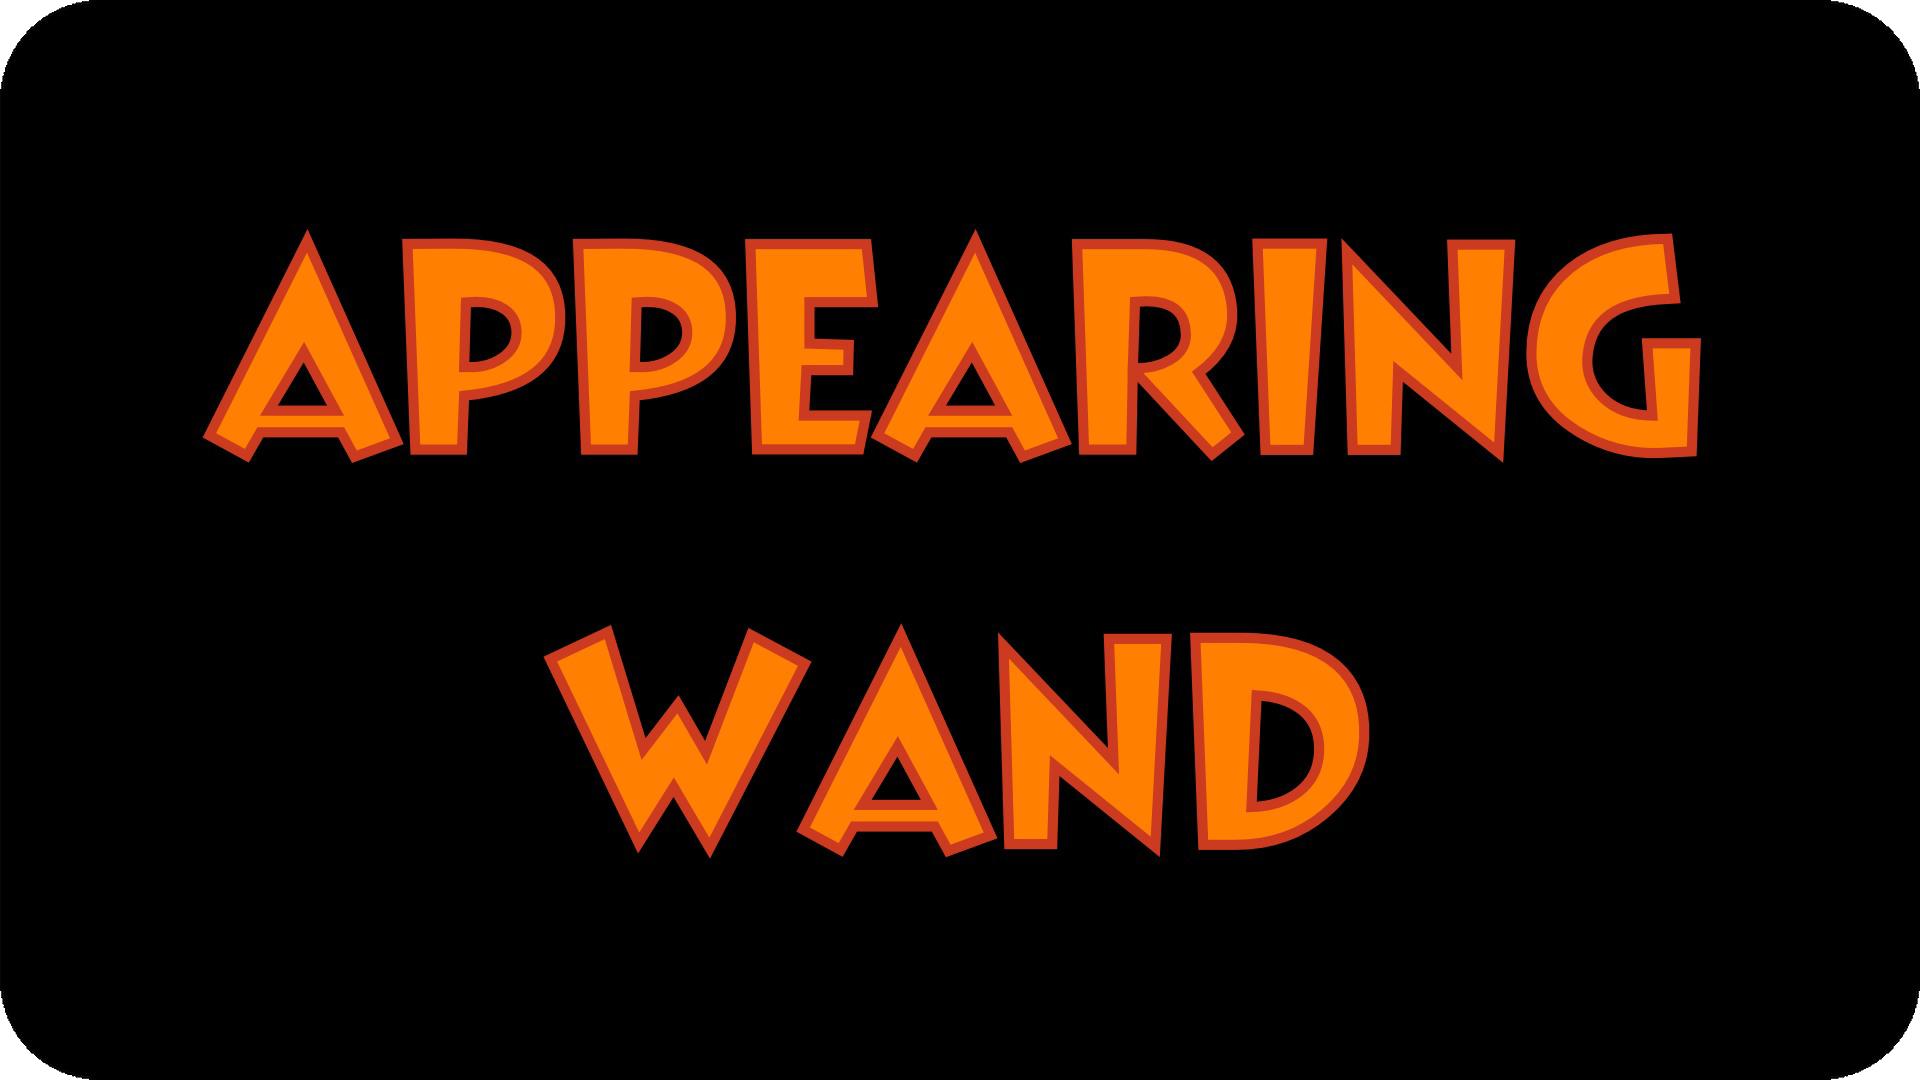 wand button cutout